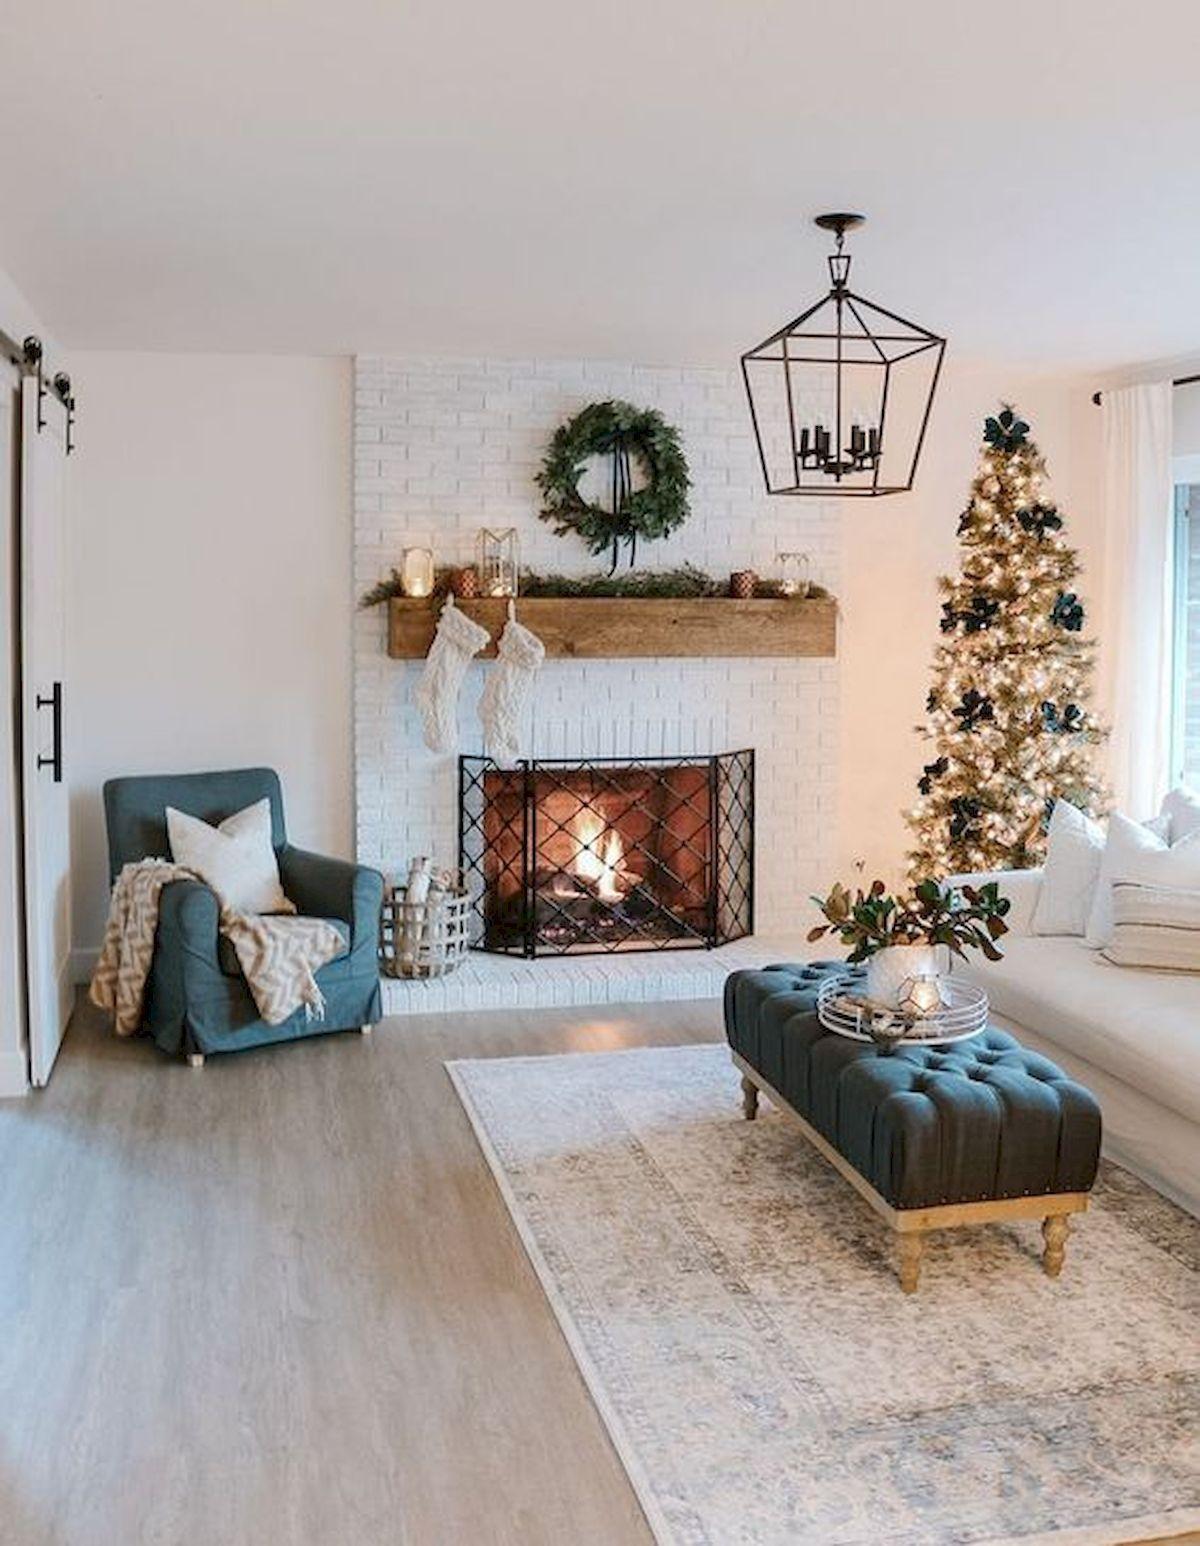 16 Beautiful Farmhouse Living Room Decor With Christmas Ideas